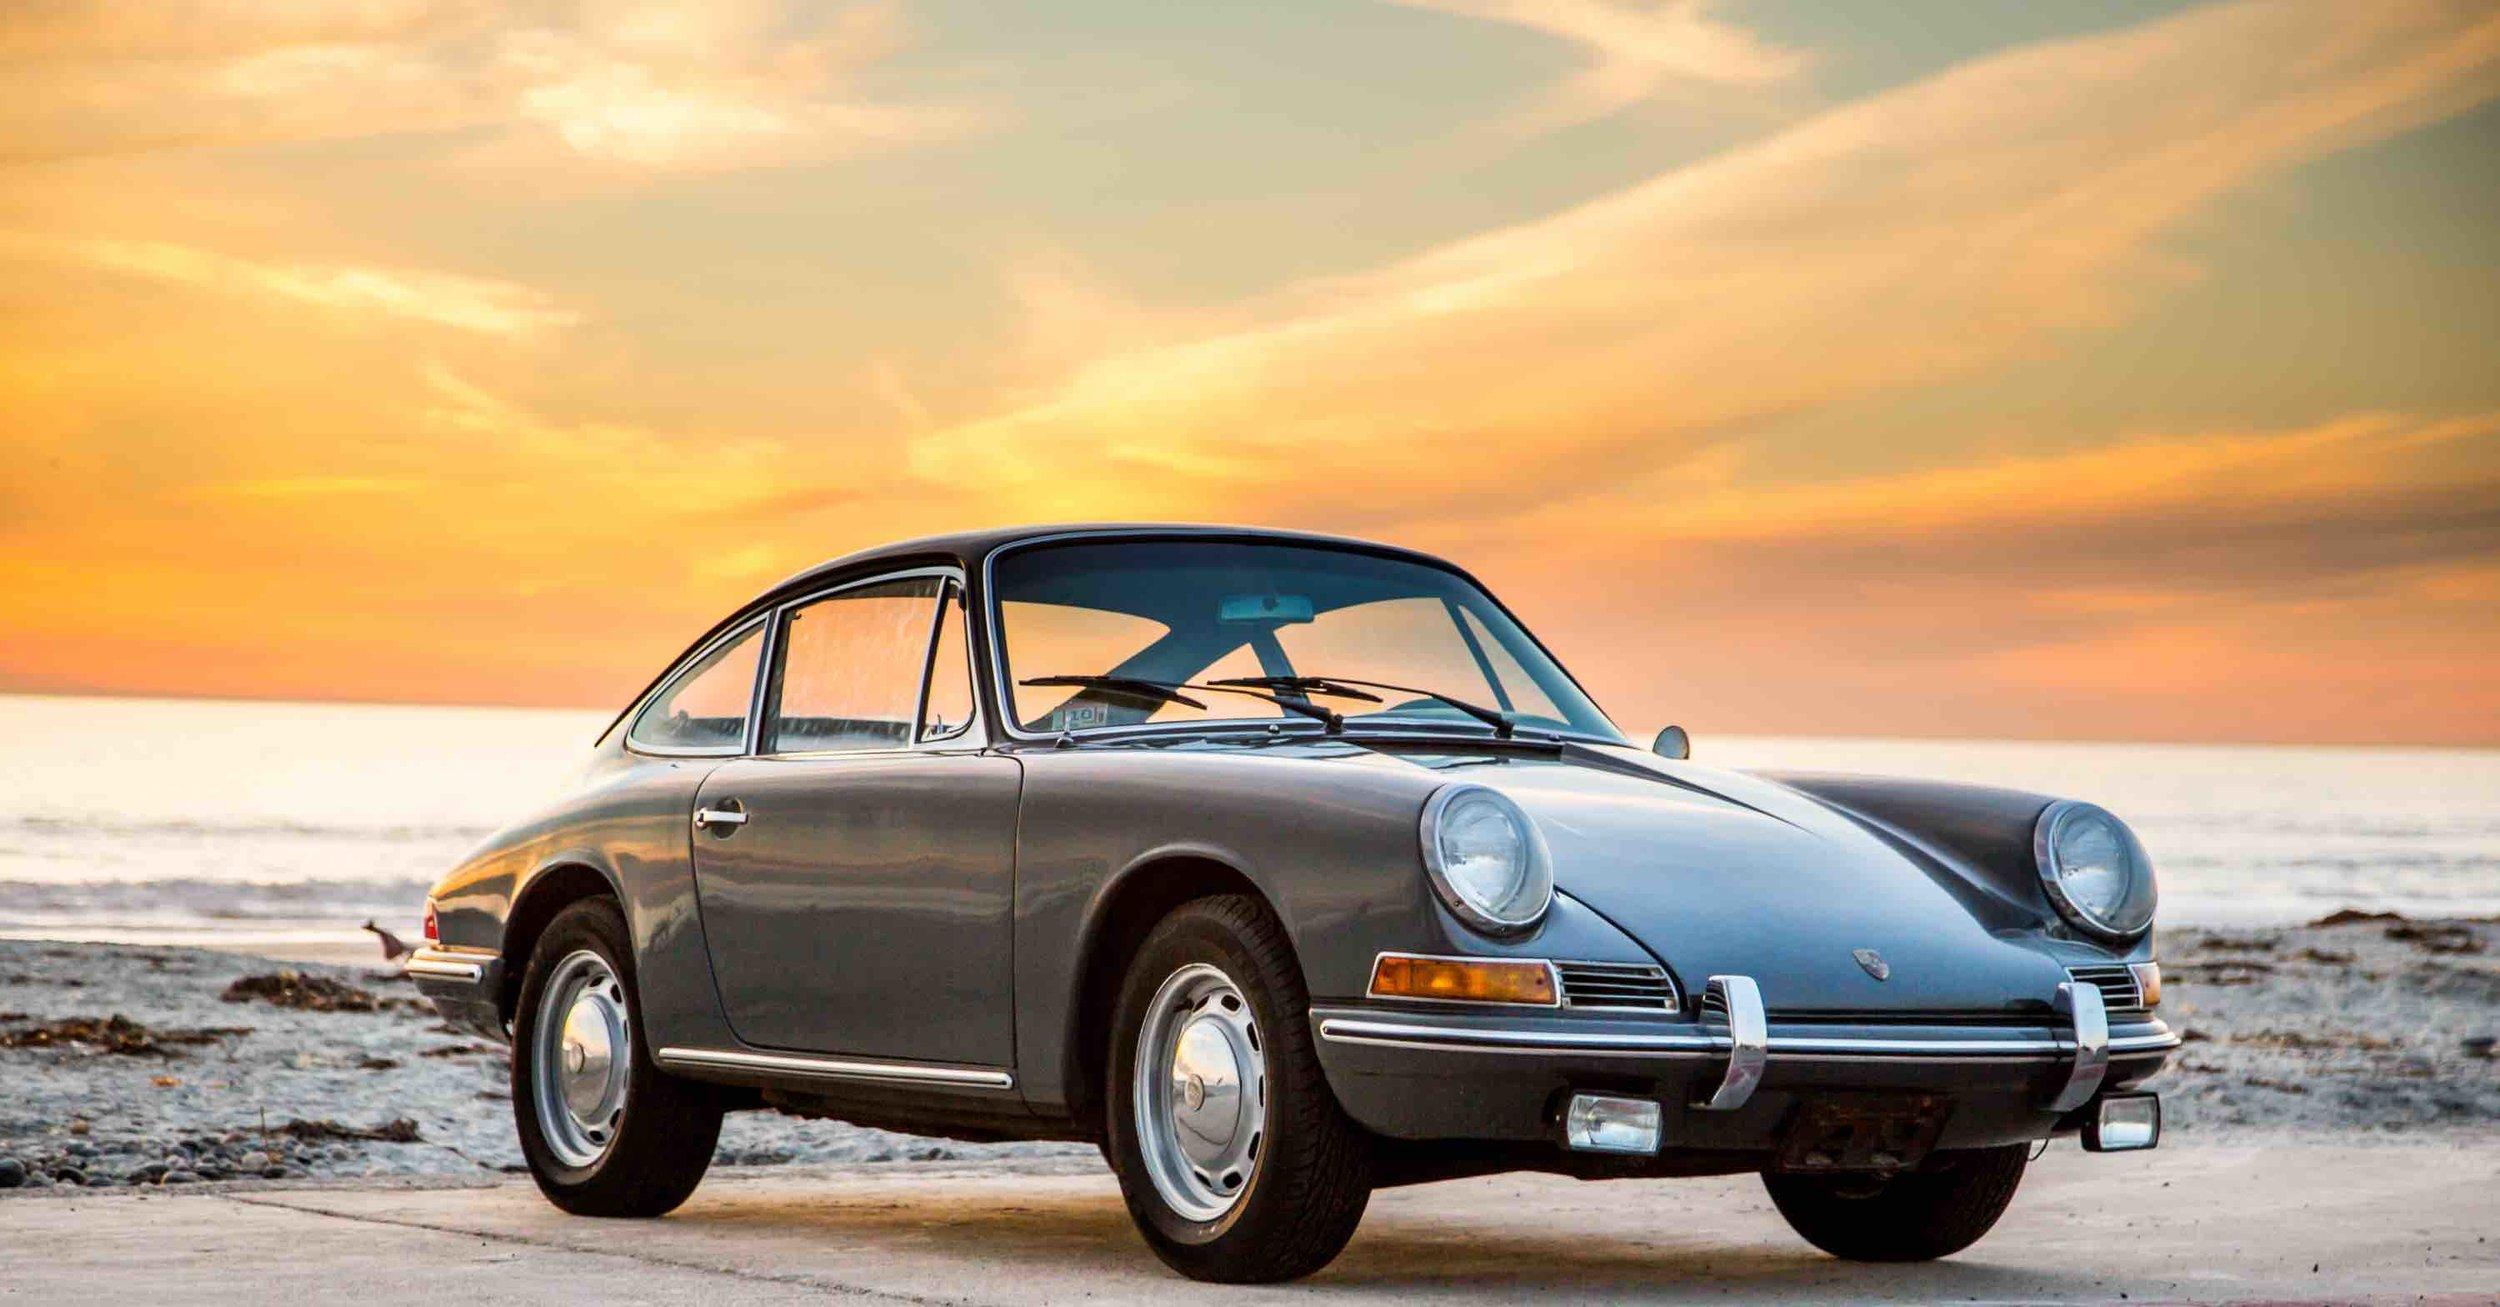 1966-porsche-912-slate-grey-makellos-classics-passenger-front-side-angle.jpeg